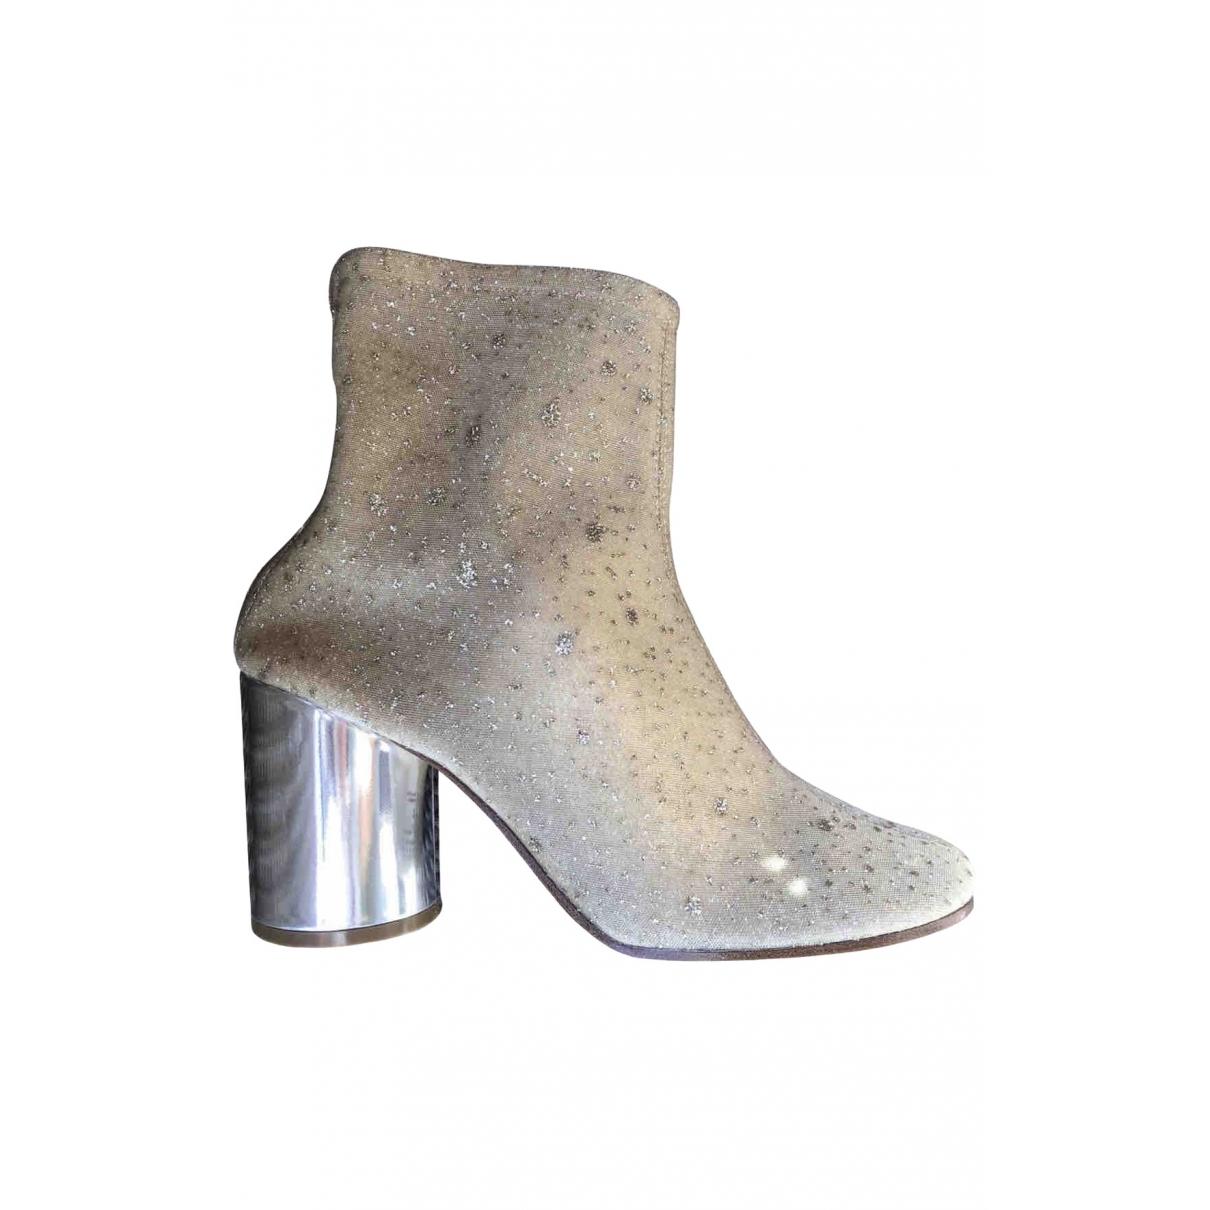 Maison Martin Margiela \N Gold Glitter Ankle boots for Women 39 EU